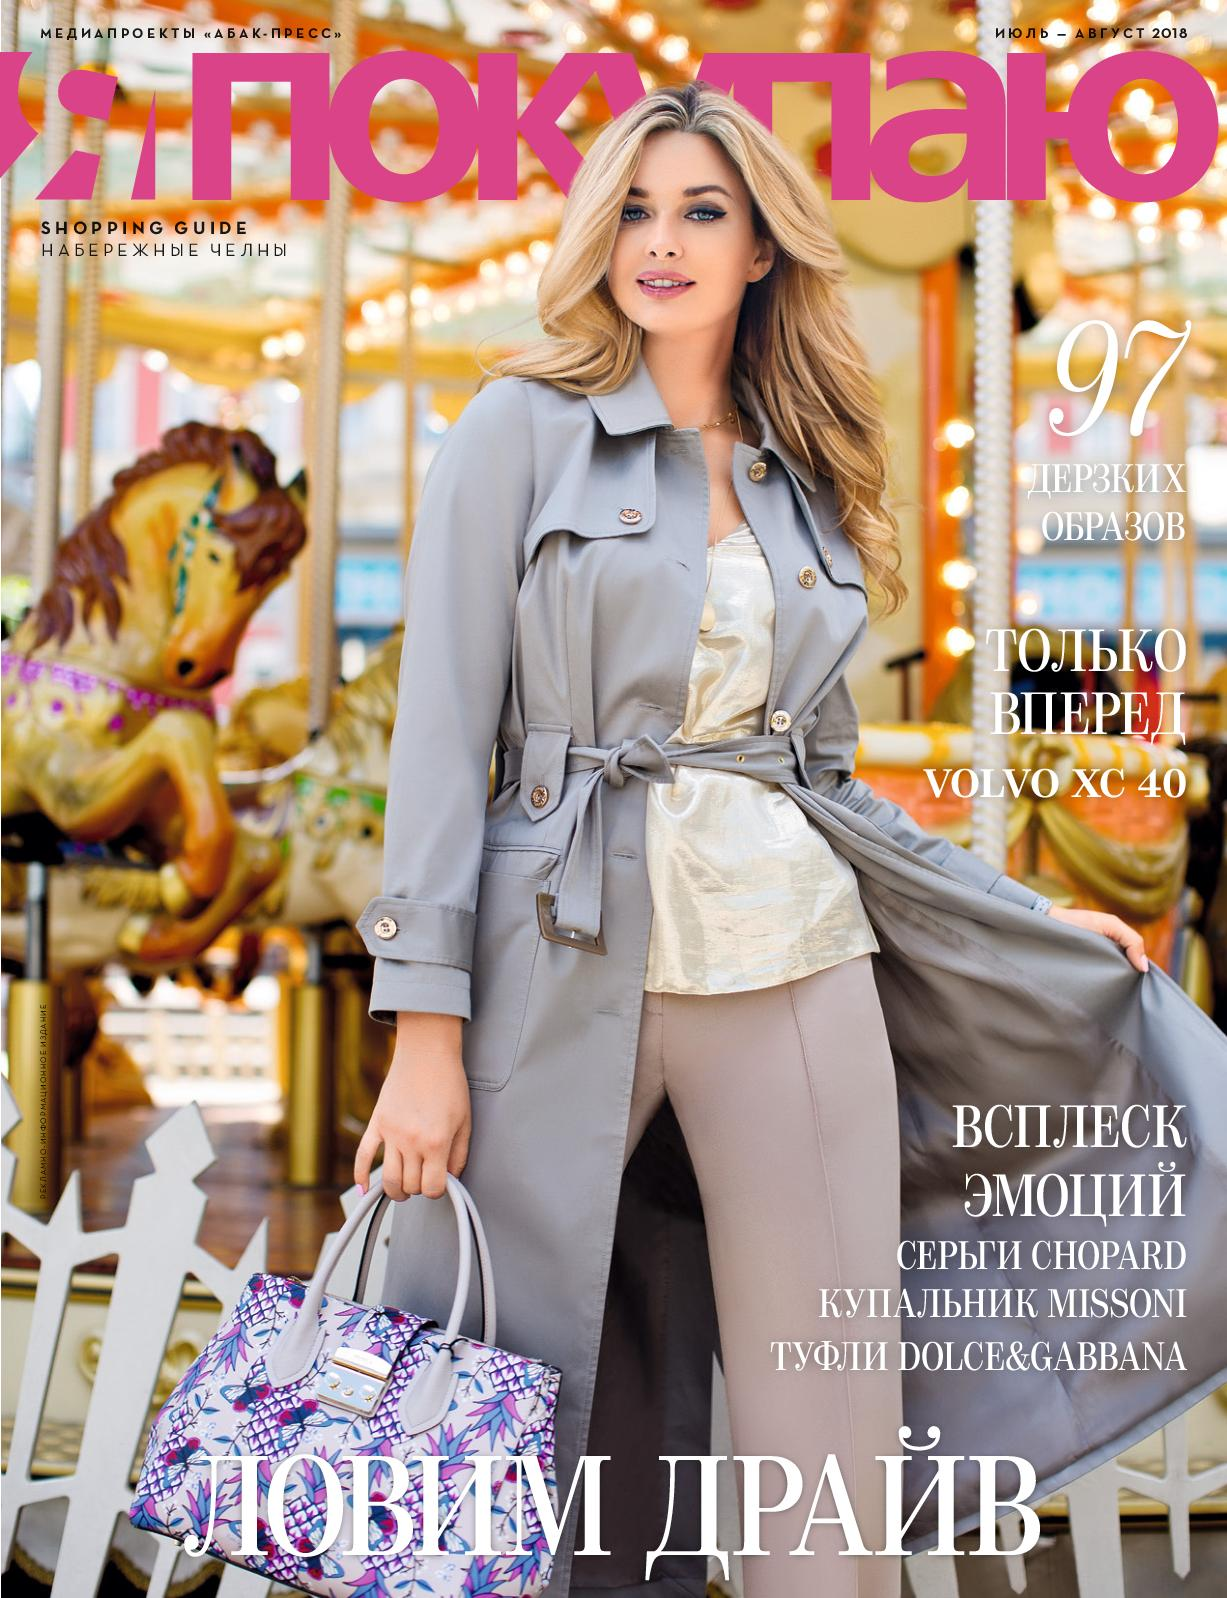 e86a32139fa2671 Calaméo - Shopping Guide «Я Покупаю. Набережные Челны», июль-август 2018